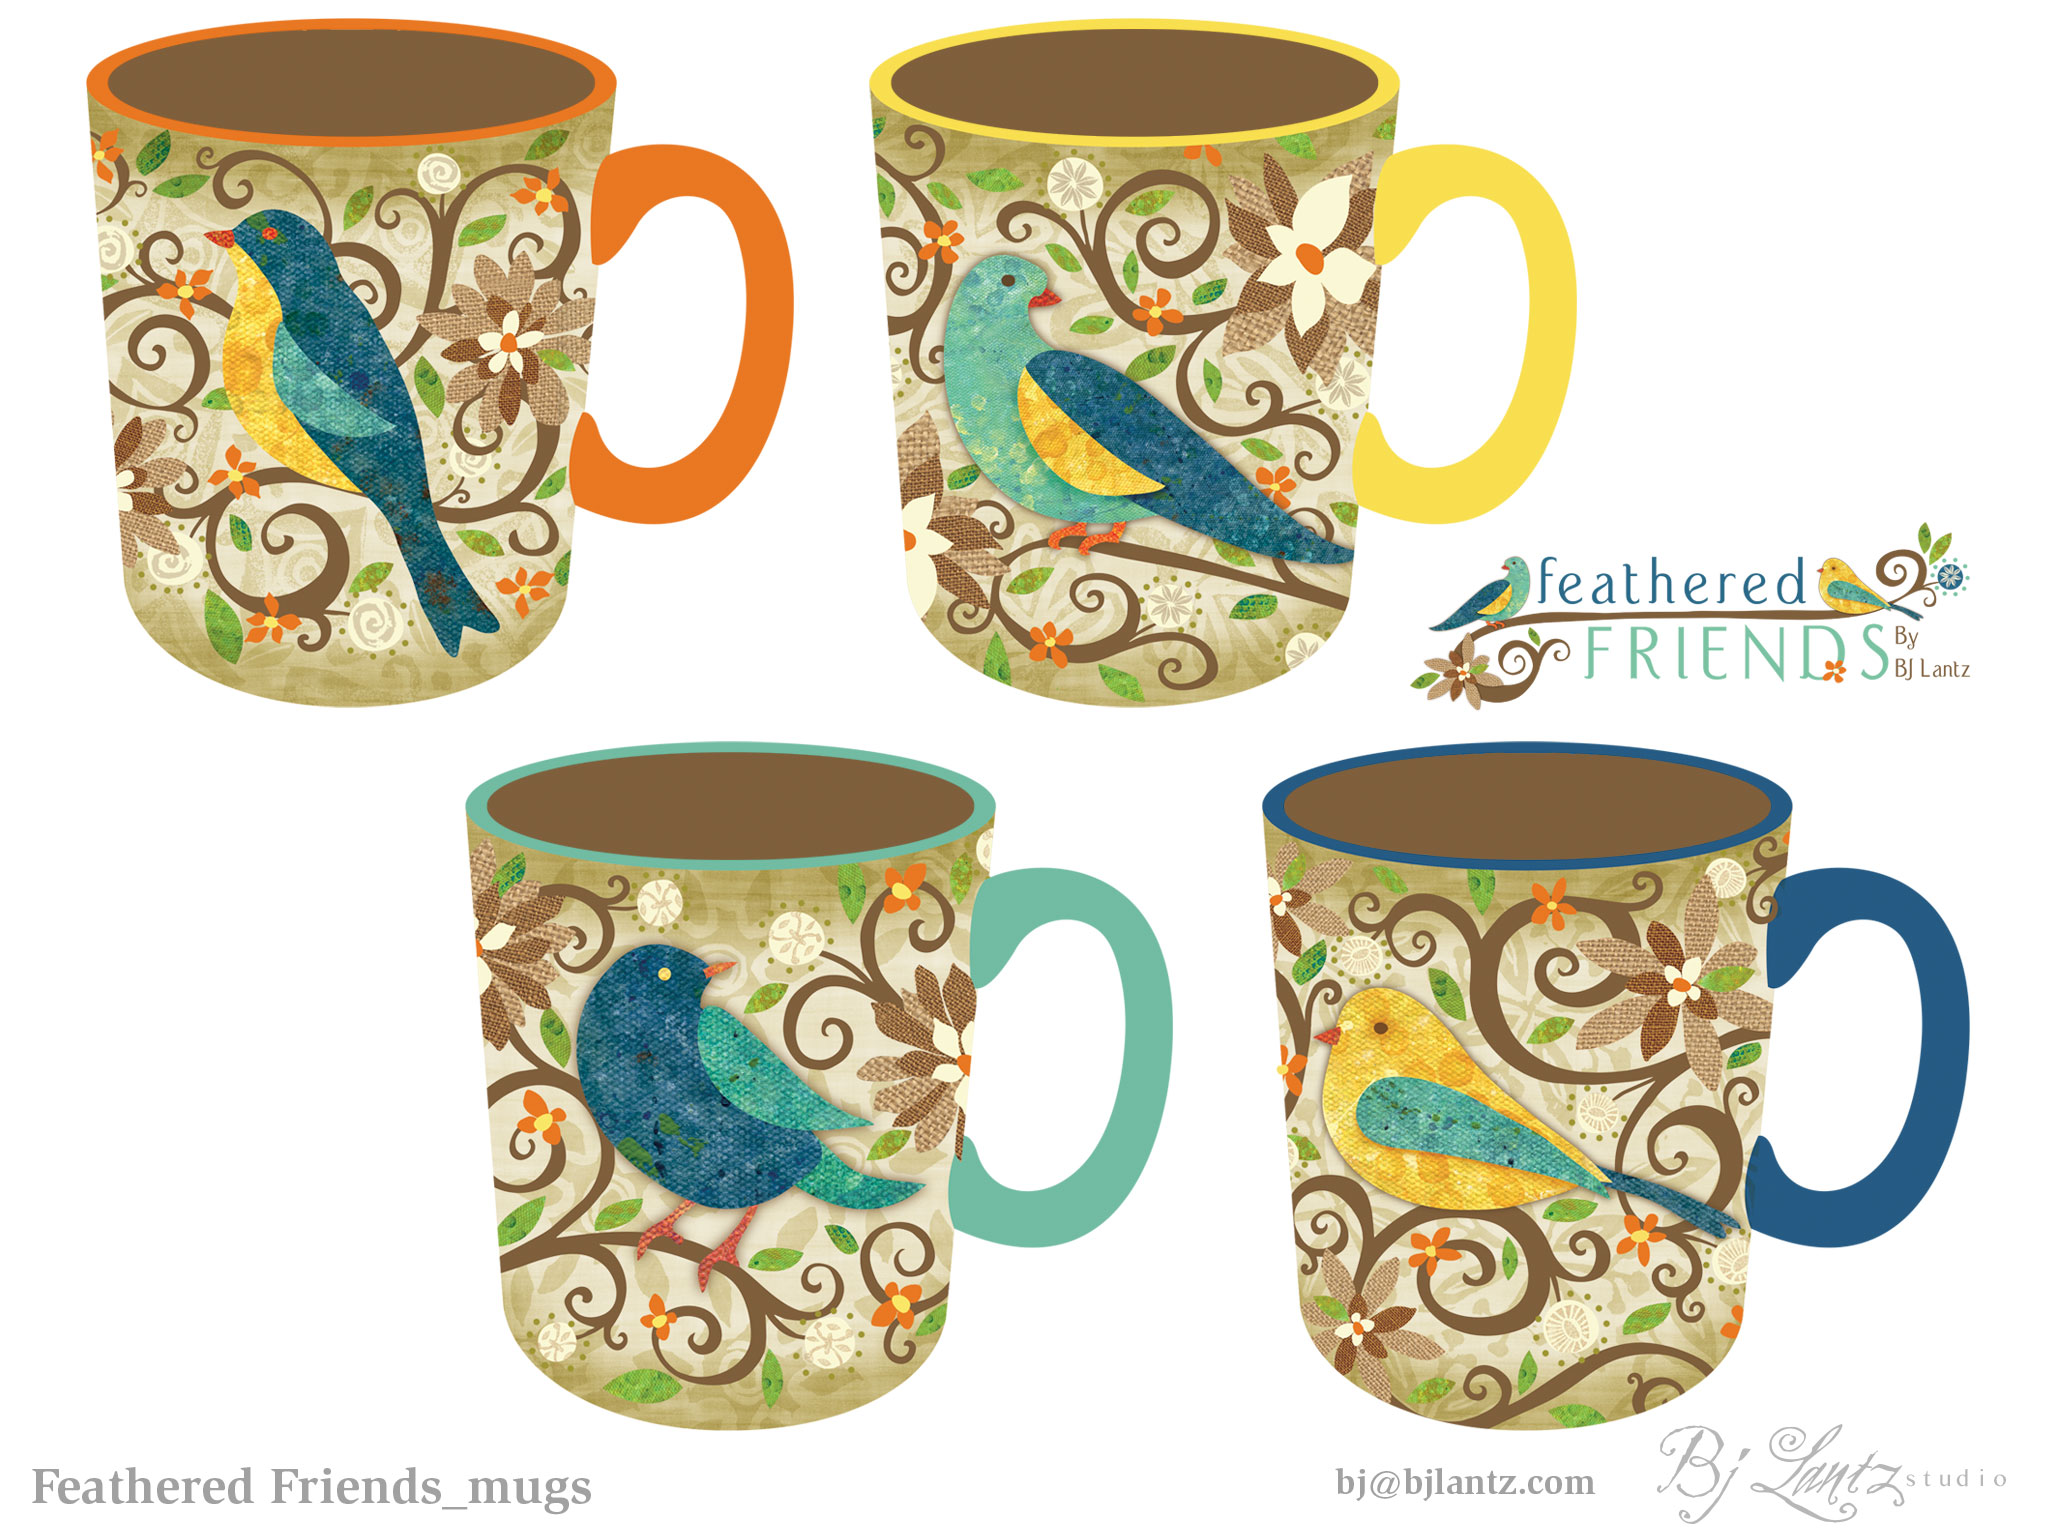 FeatheredFriends_5_BJLantz_portfolio.jpg